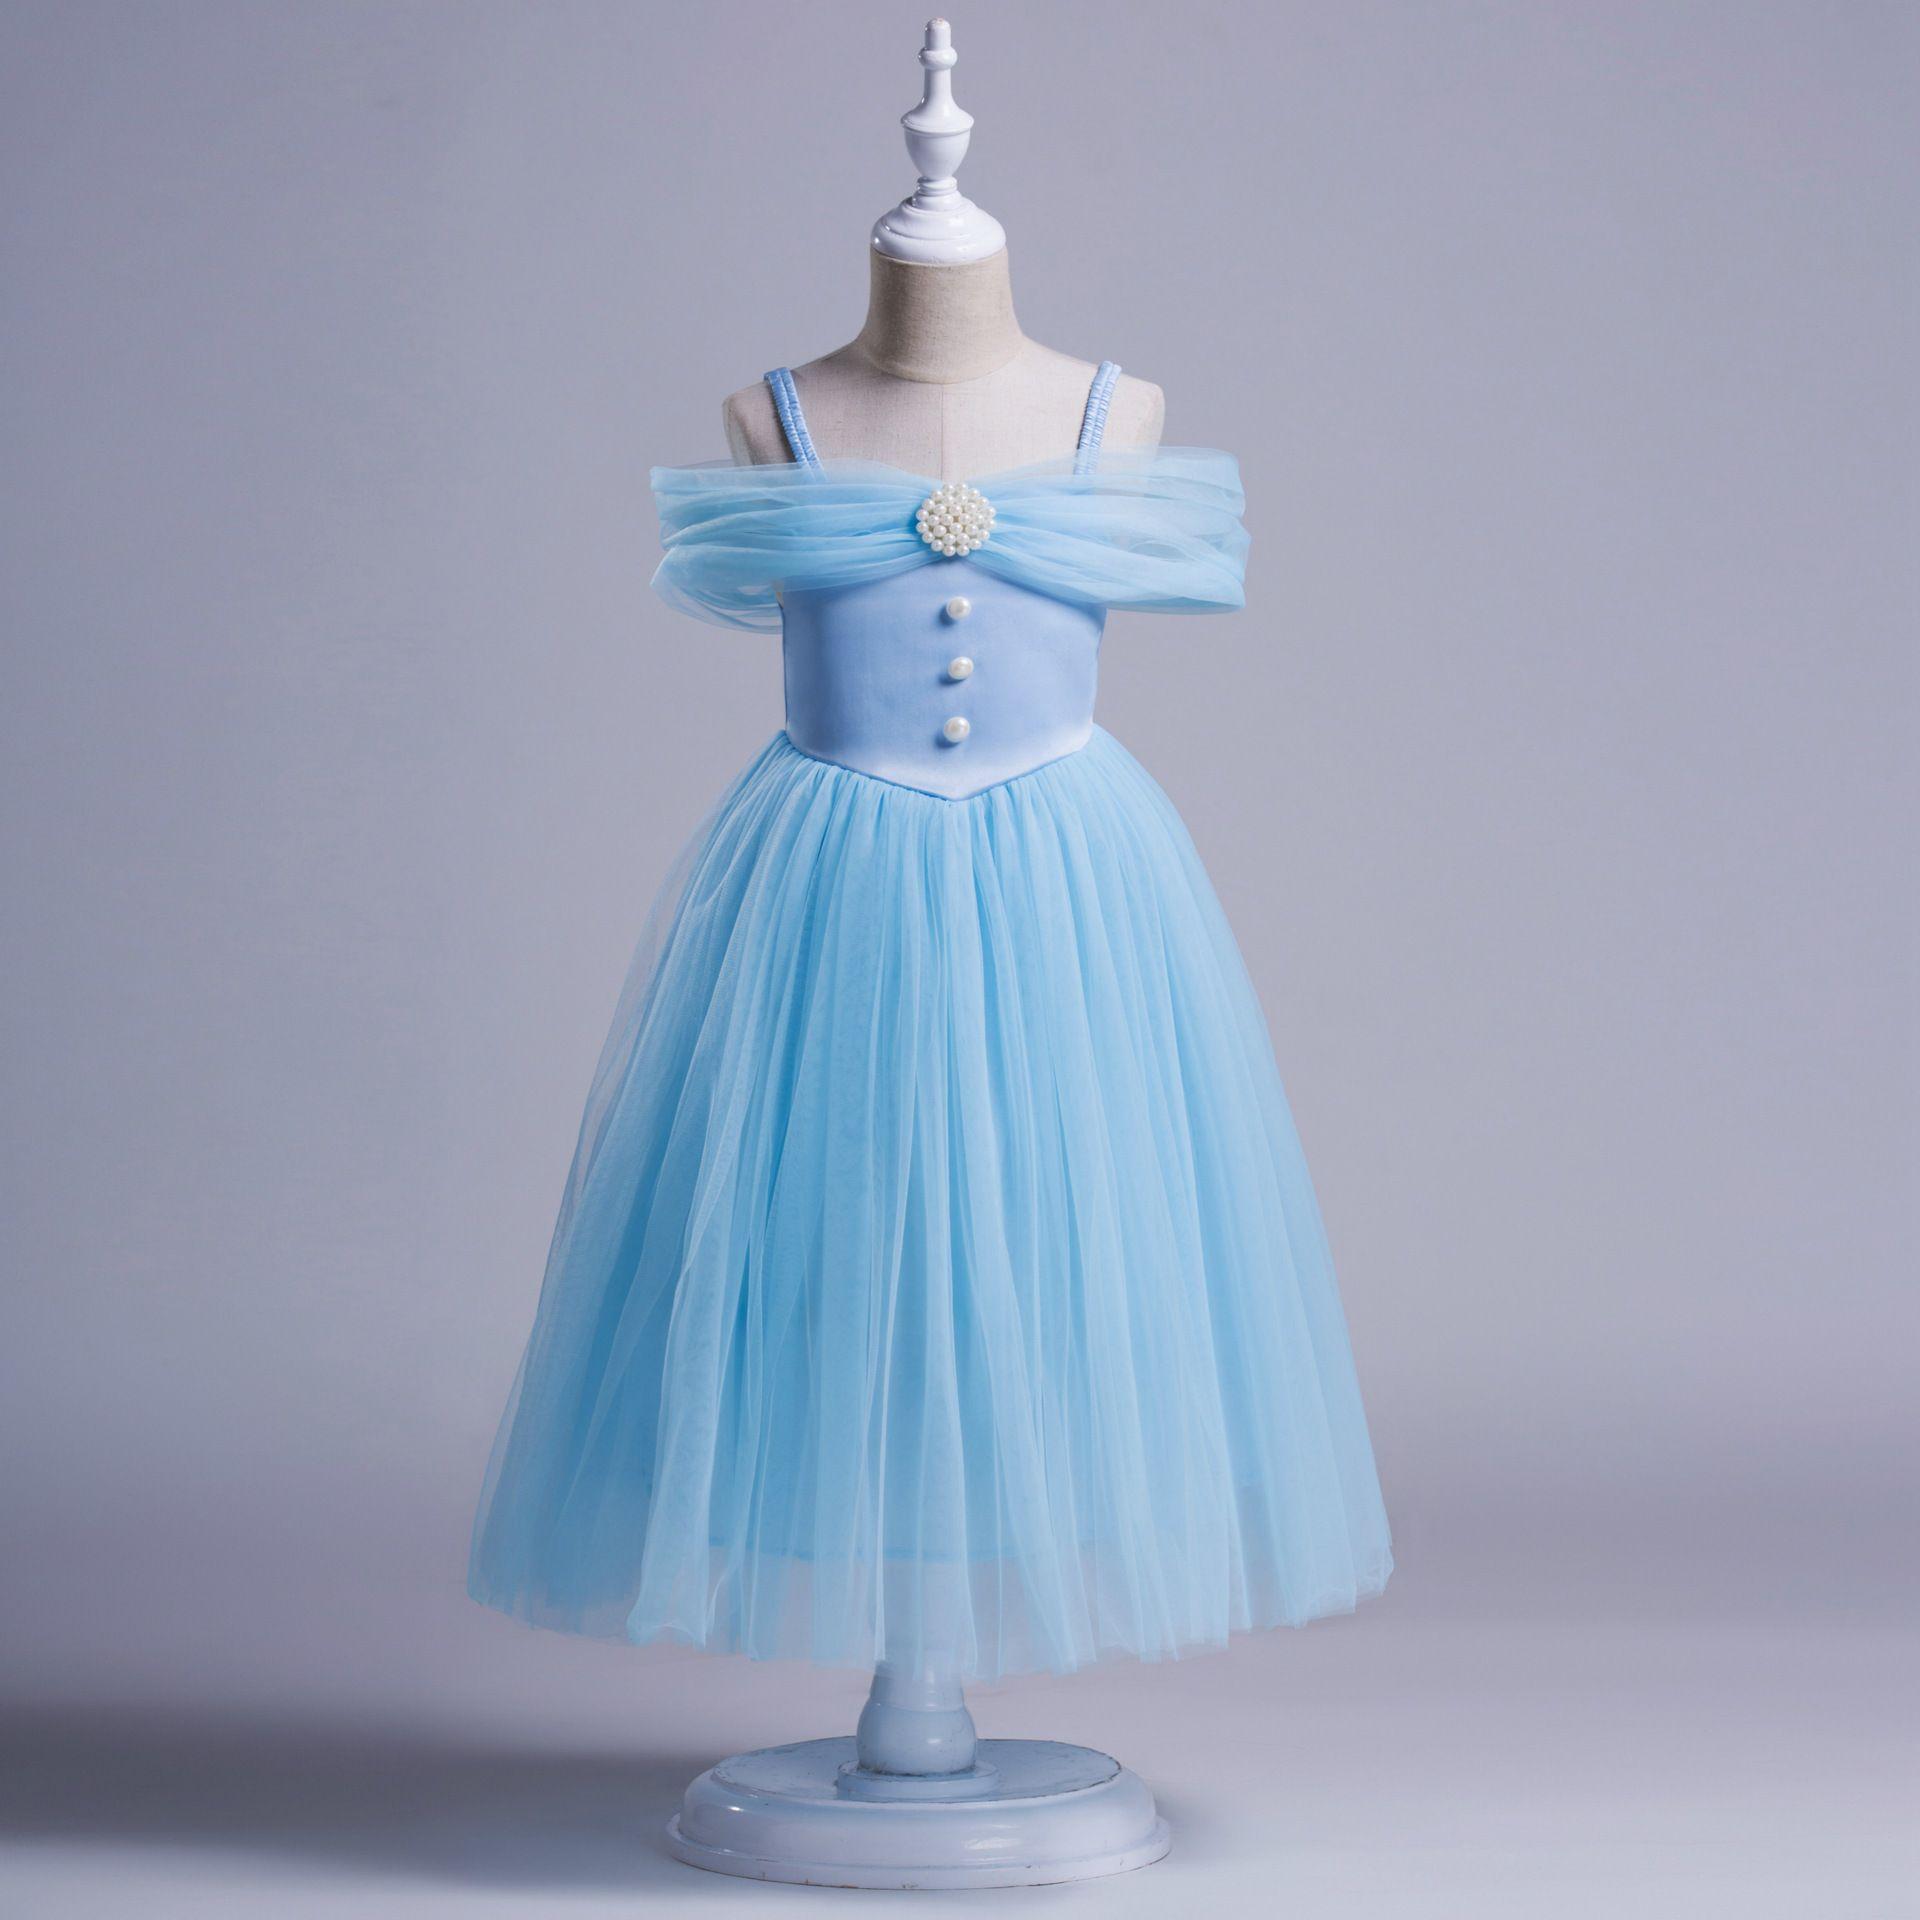 2018 Girls Lace Tutu Dresses Kids Clothing 2017 Baby Girl Princess ...